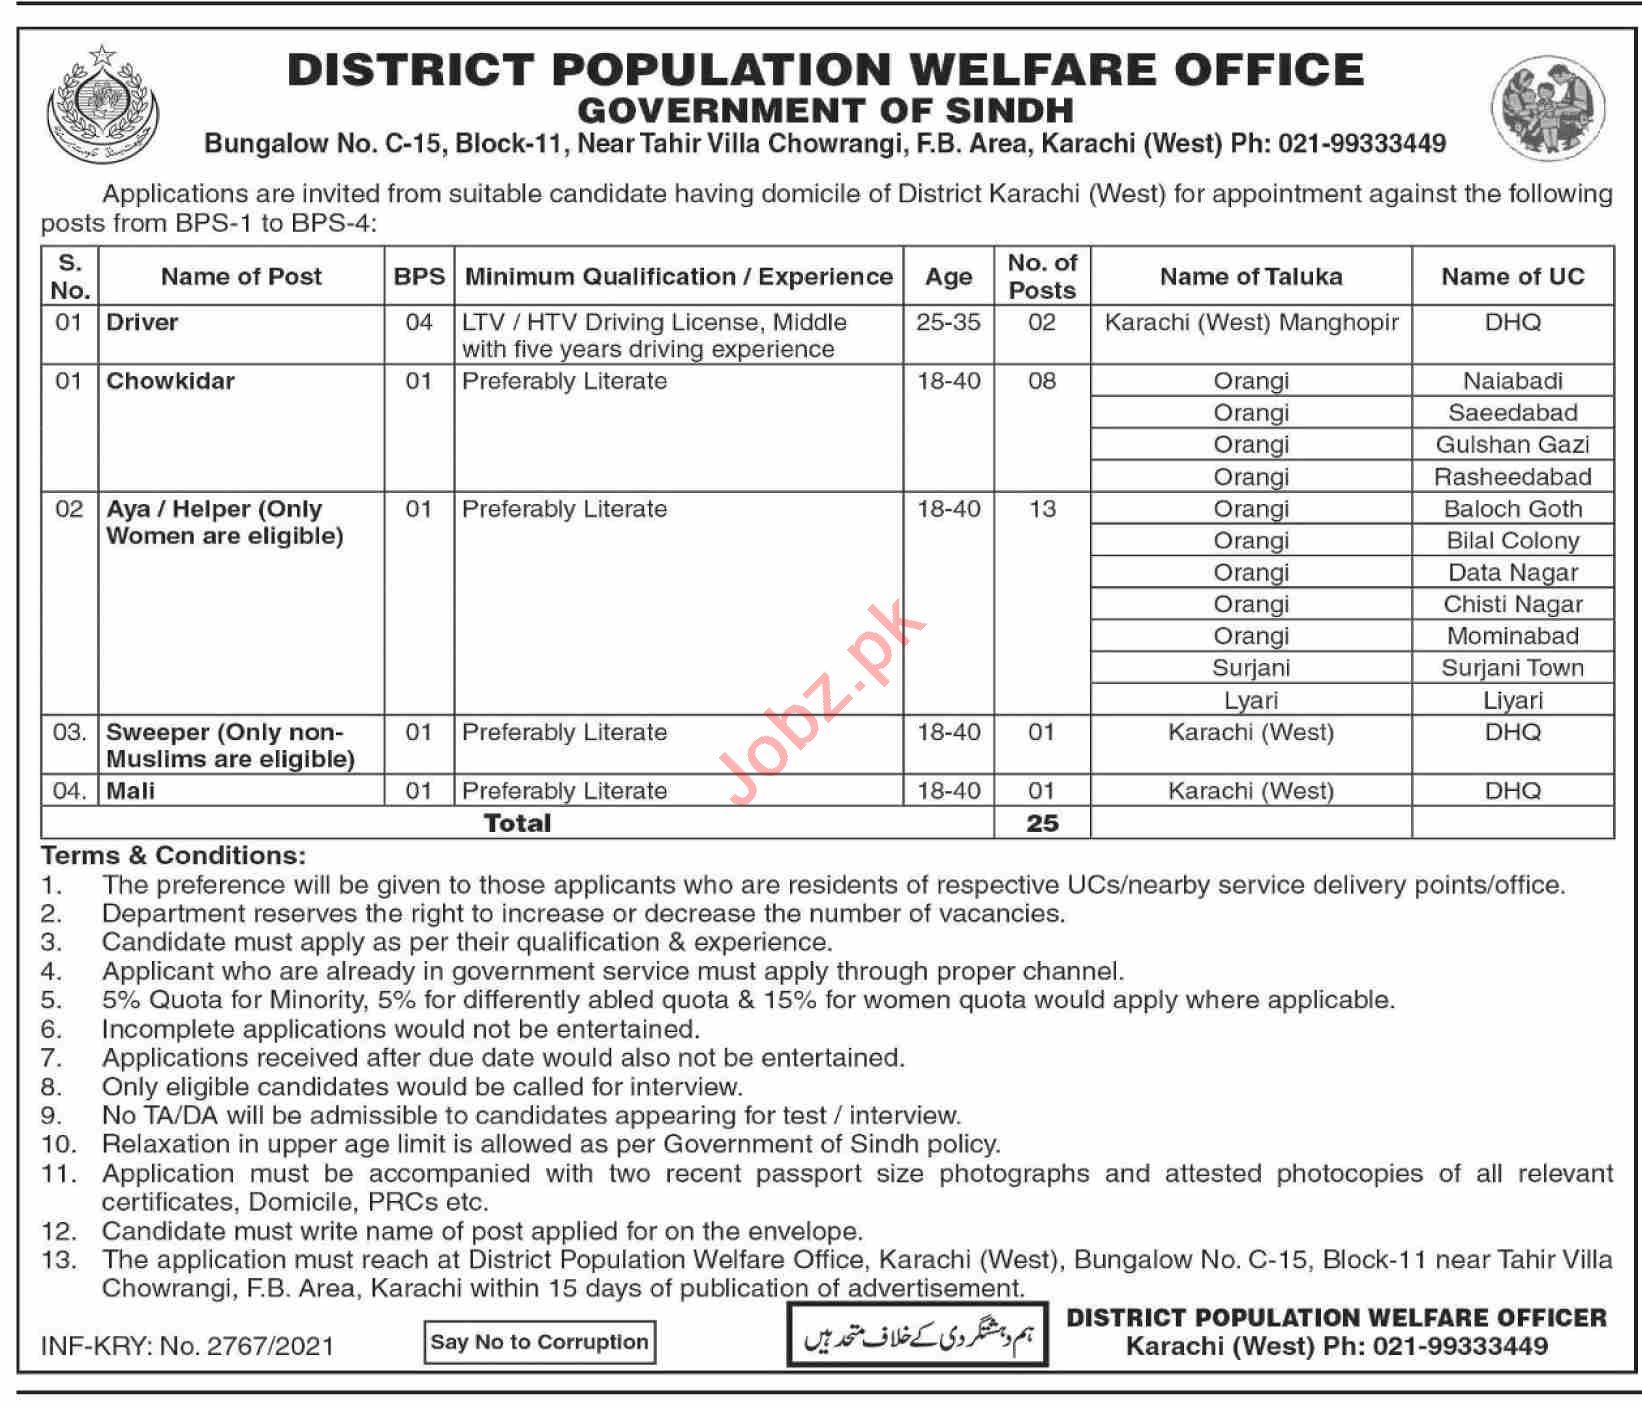 Karachi Population Welfare Office Jobs 2021 in Pakistan